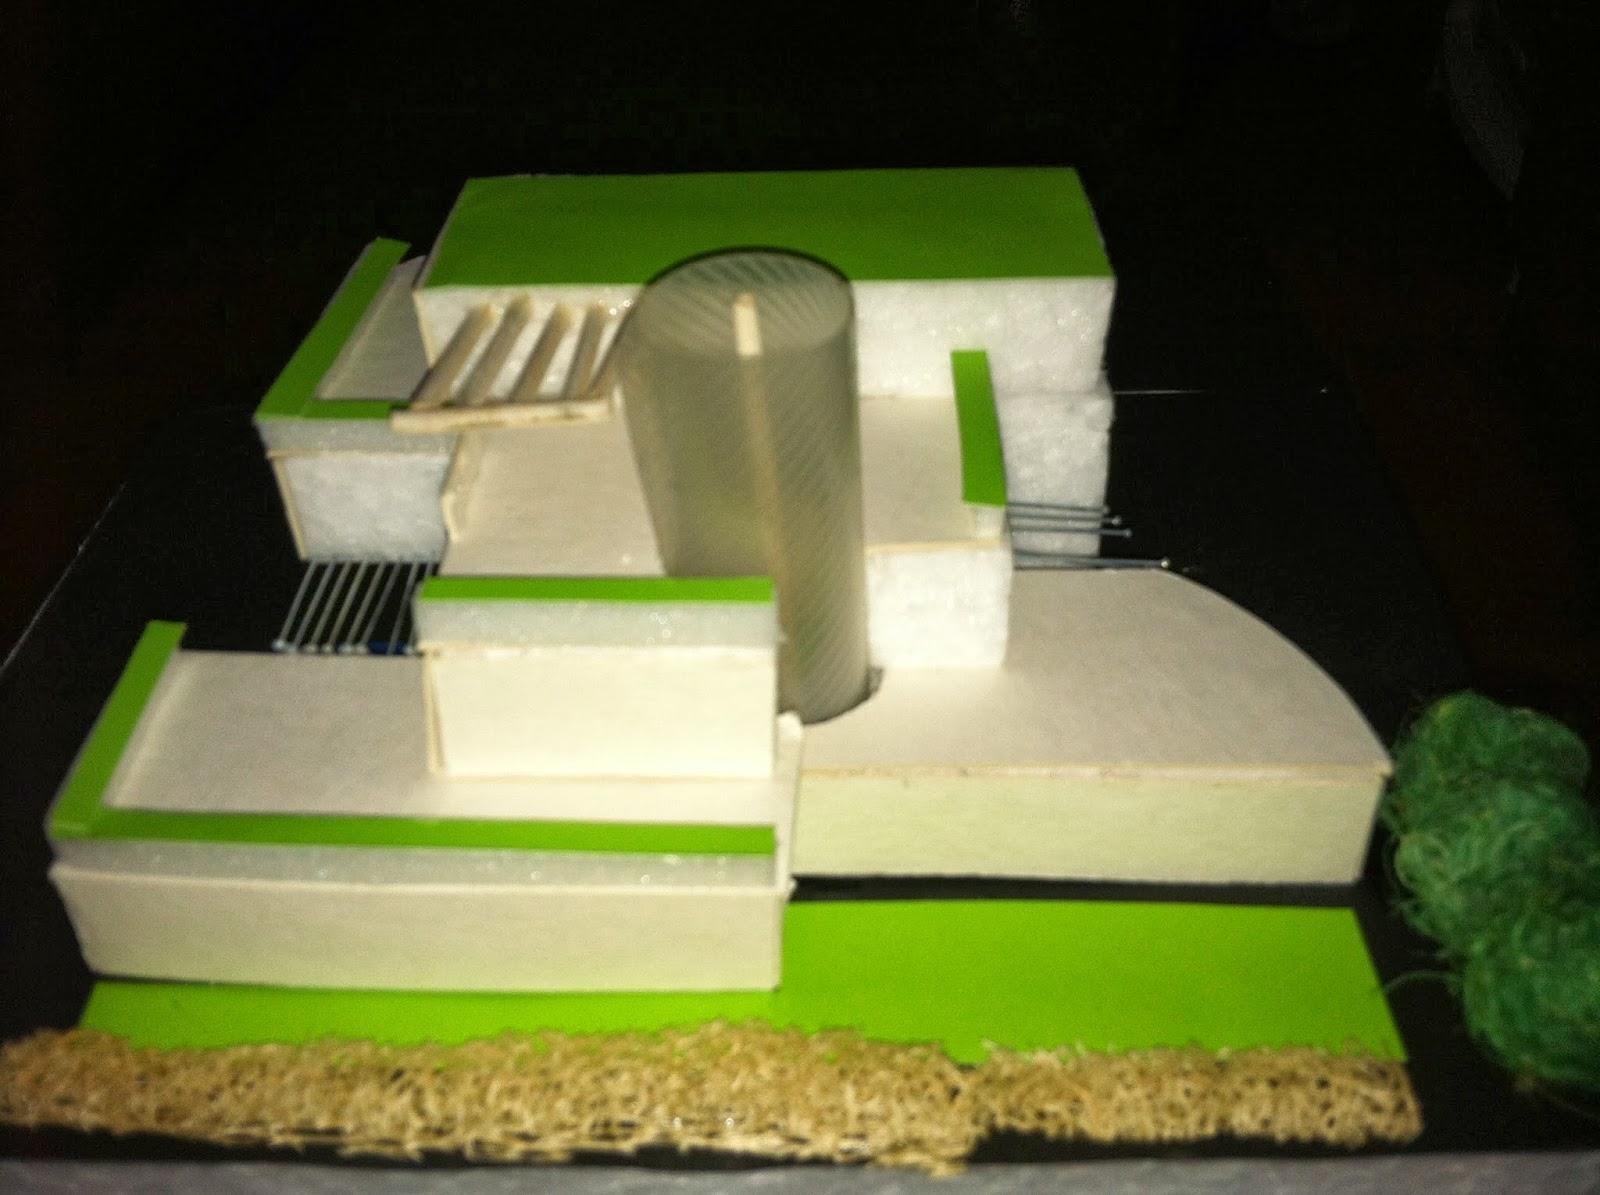 Arquitectura organica maqueta volumetrica for Maquetas de jardines